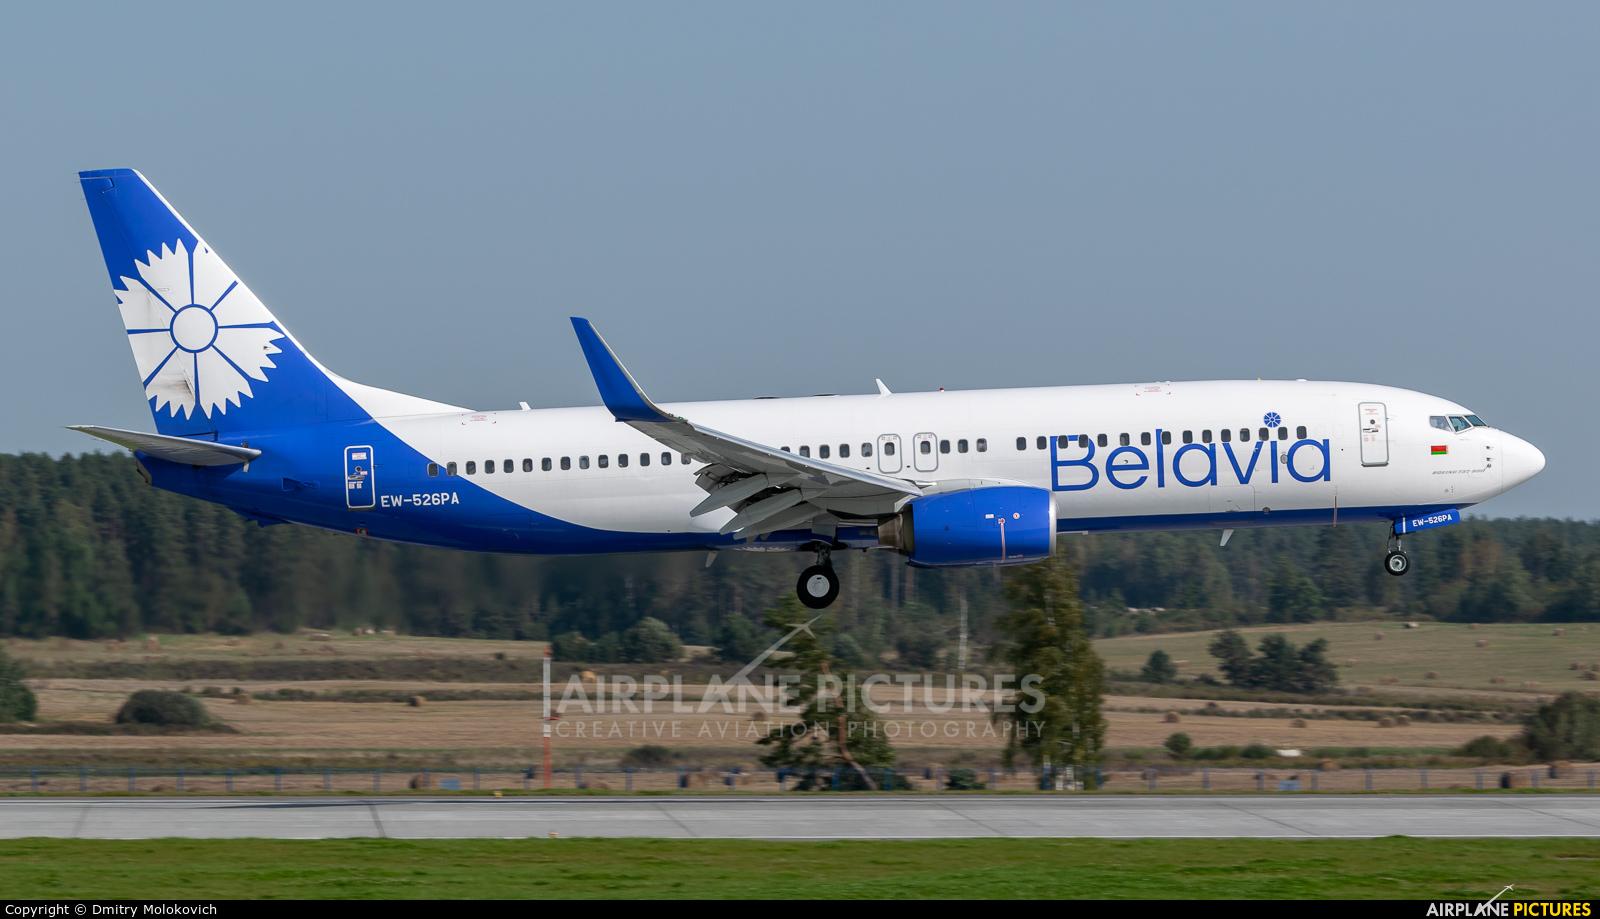 Belavia EW-526PA aircraft at Minsk Intl